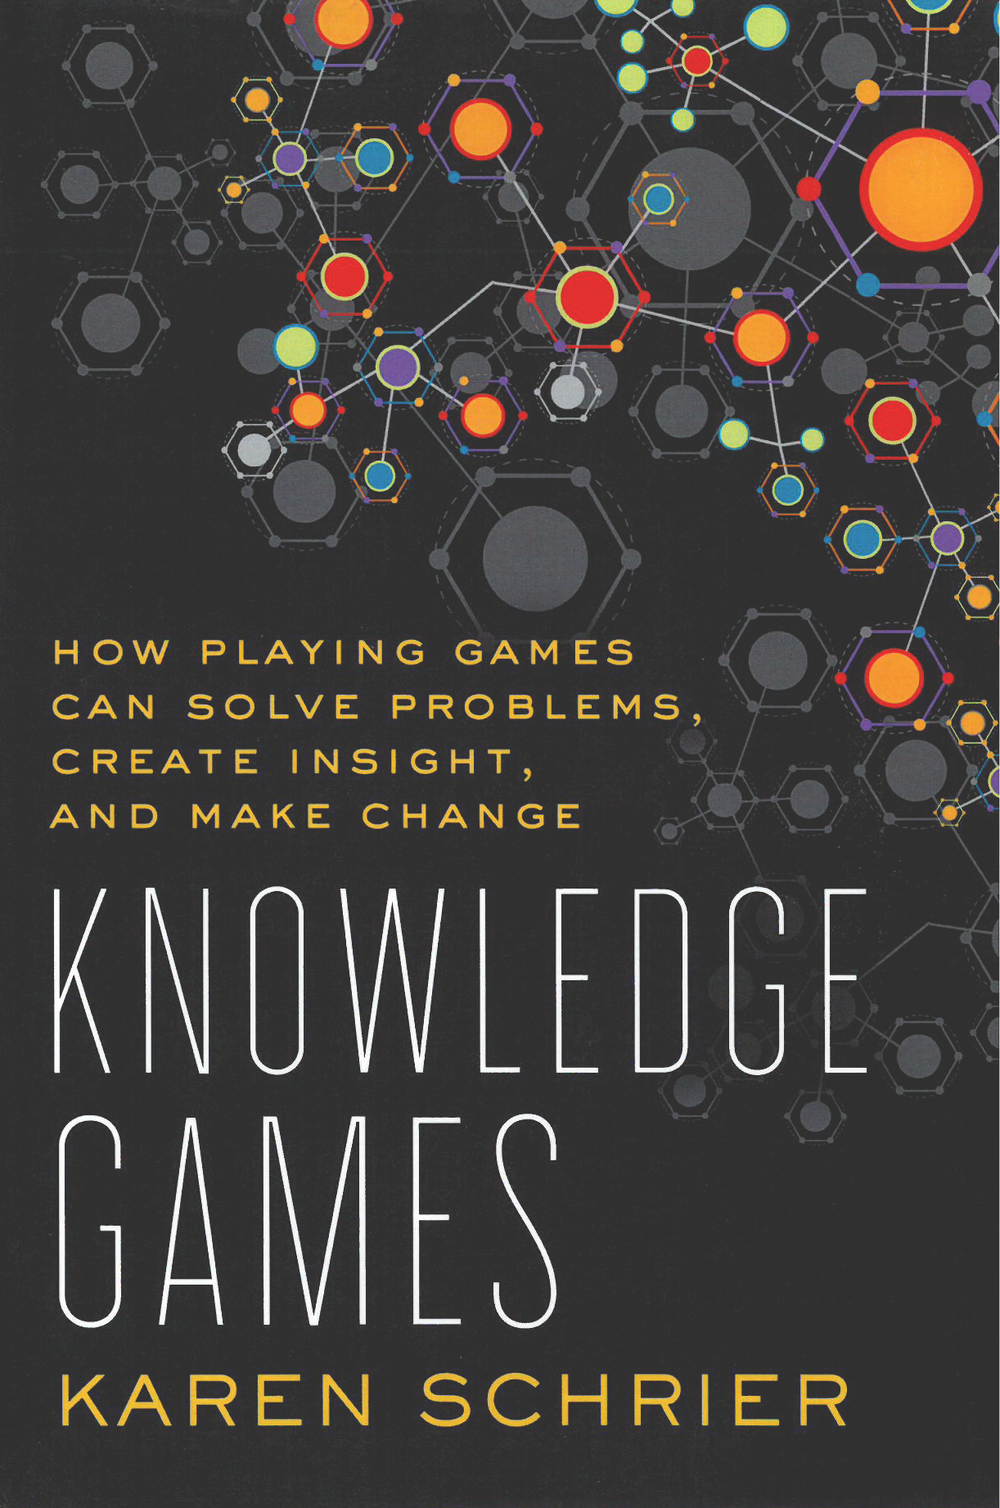 Karen-Schrier-Knowledge-Games.png